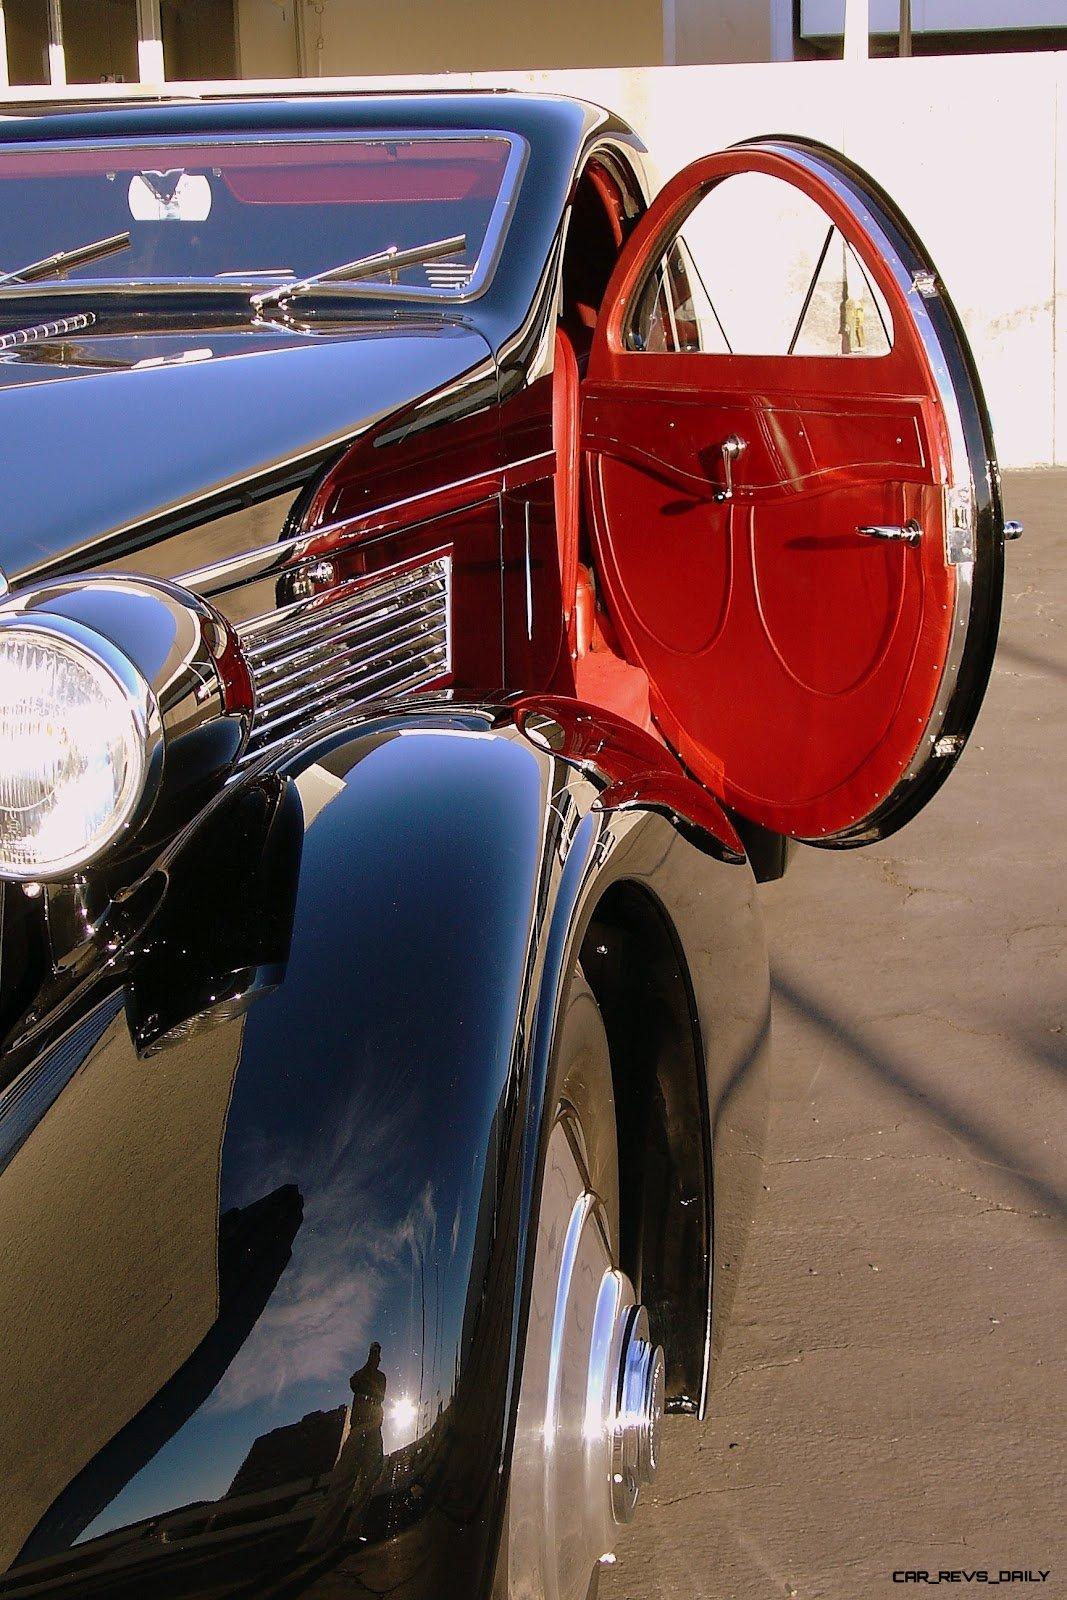 1925 Rolls Royce Phantom >> Peterson Auto Museum - 1925 Rolls-Royce Phantom I - 1934 Jonkheere Round Door Aero Coupe 33